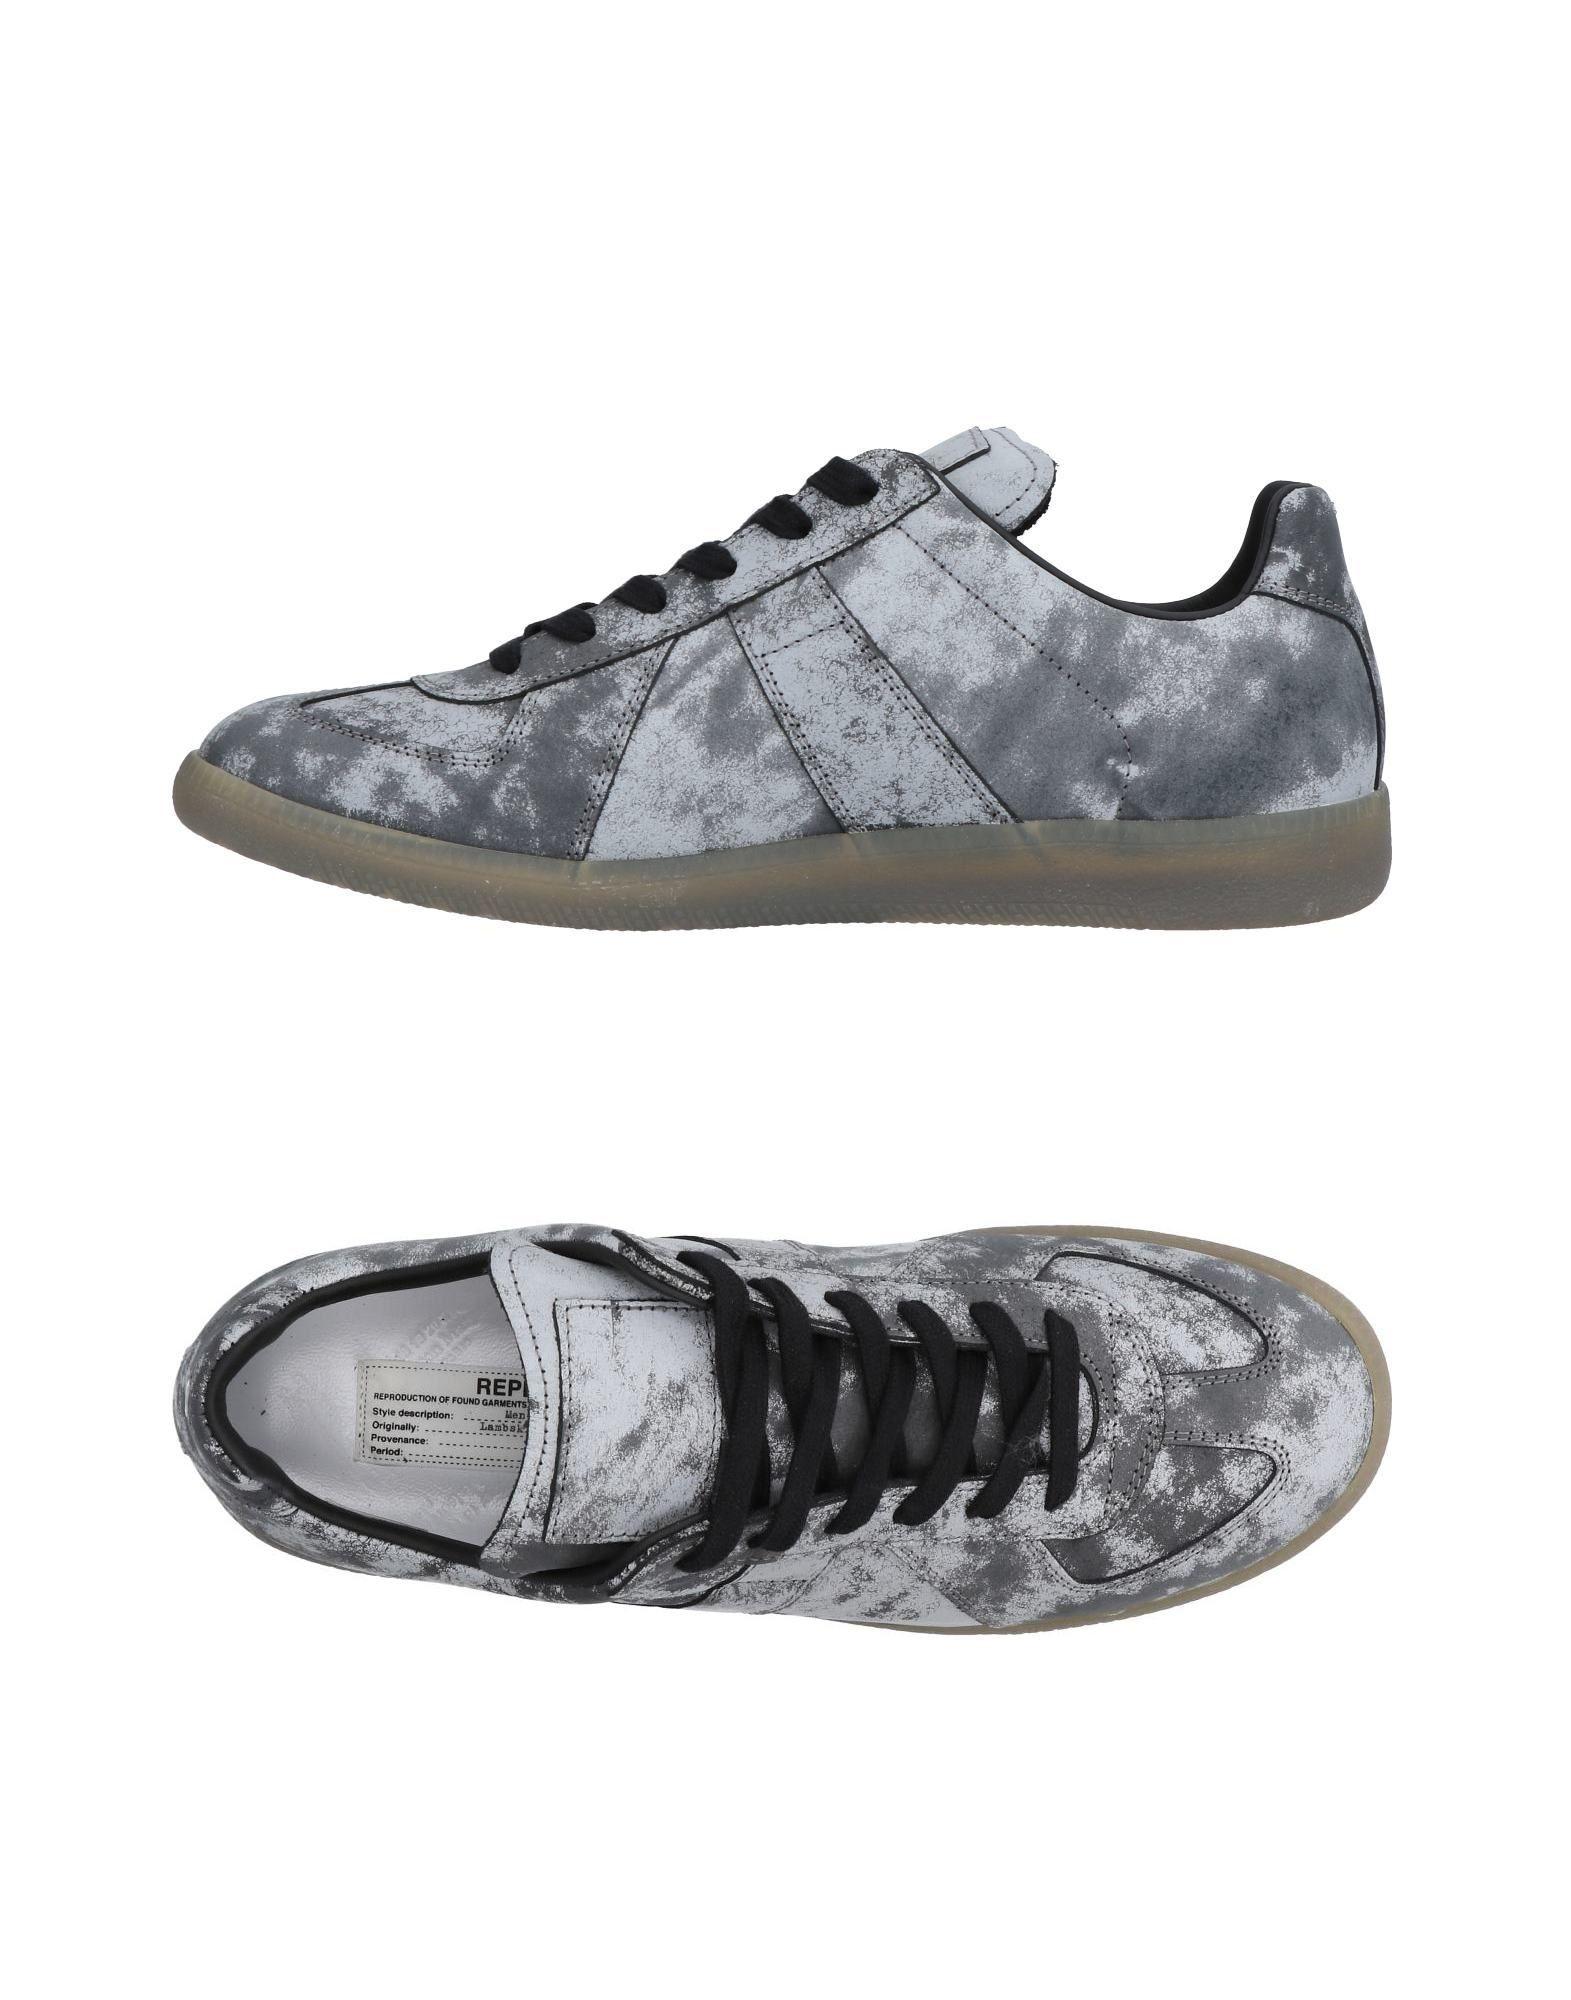 Maison Margiela Sneakers Herren  Schuhe 11472273KG Gute Qualität beliebte Schuhe  3eb655